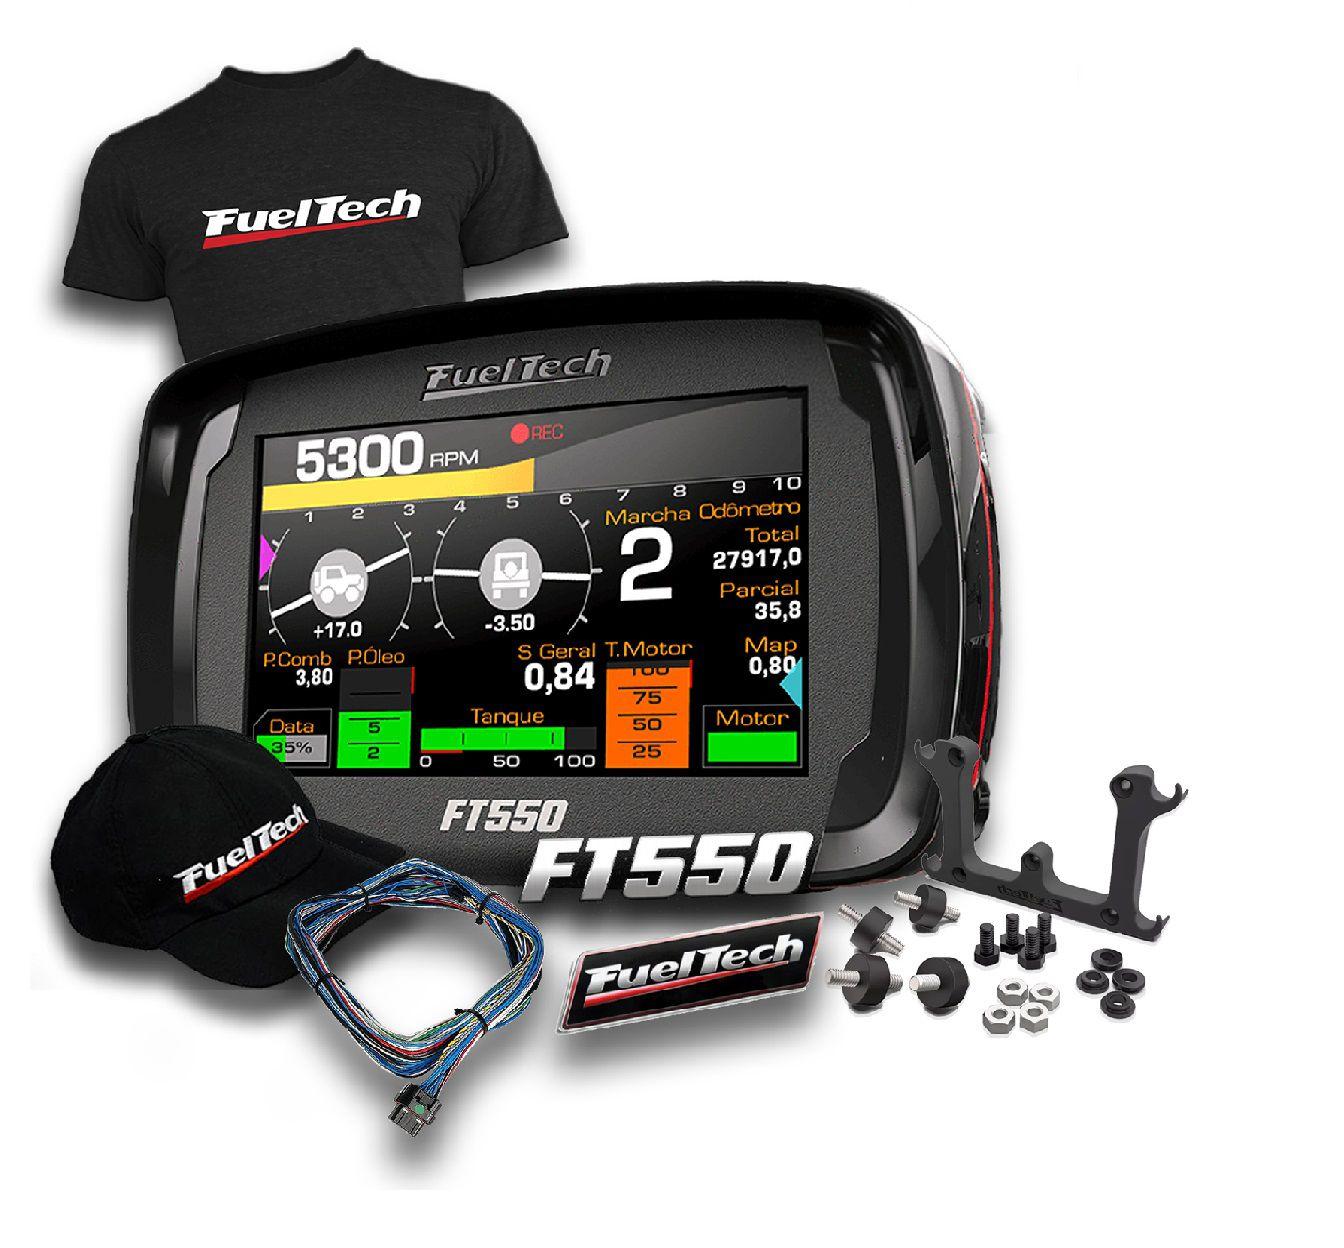 Fueltech Ft 550 + ultra Brindes+ 12x S/juros pronta entrega